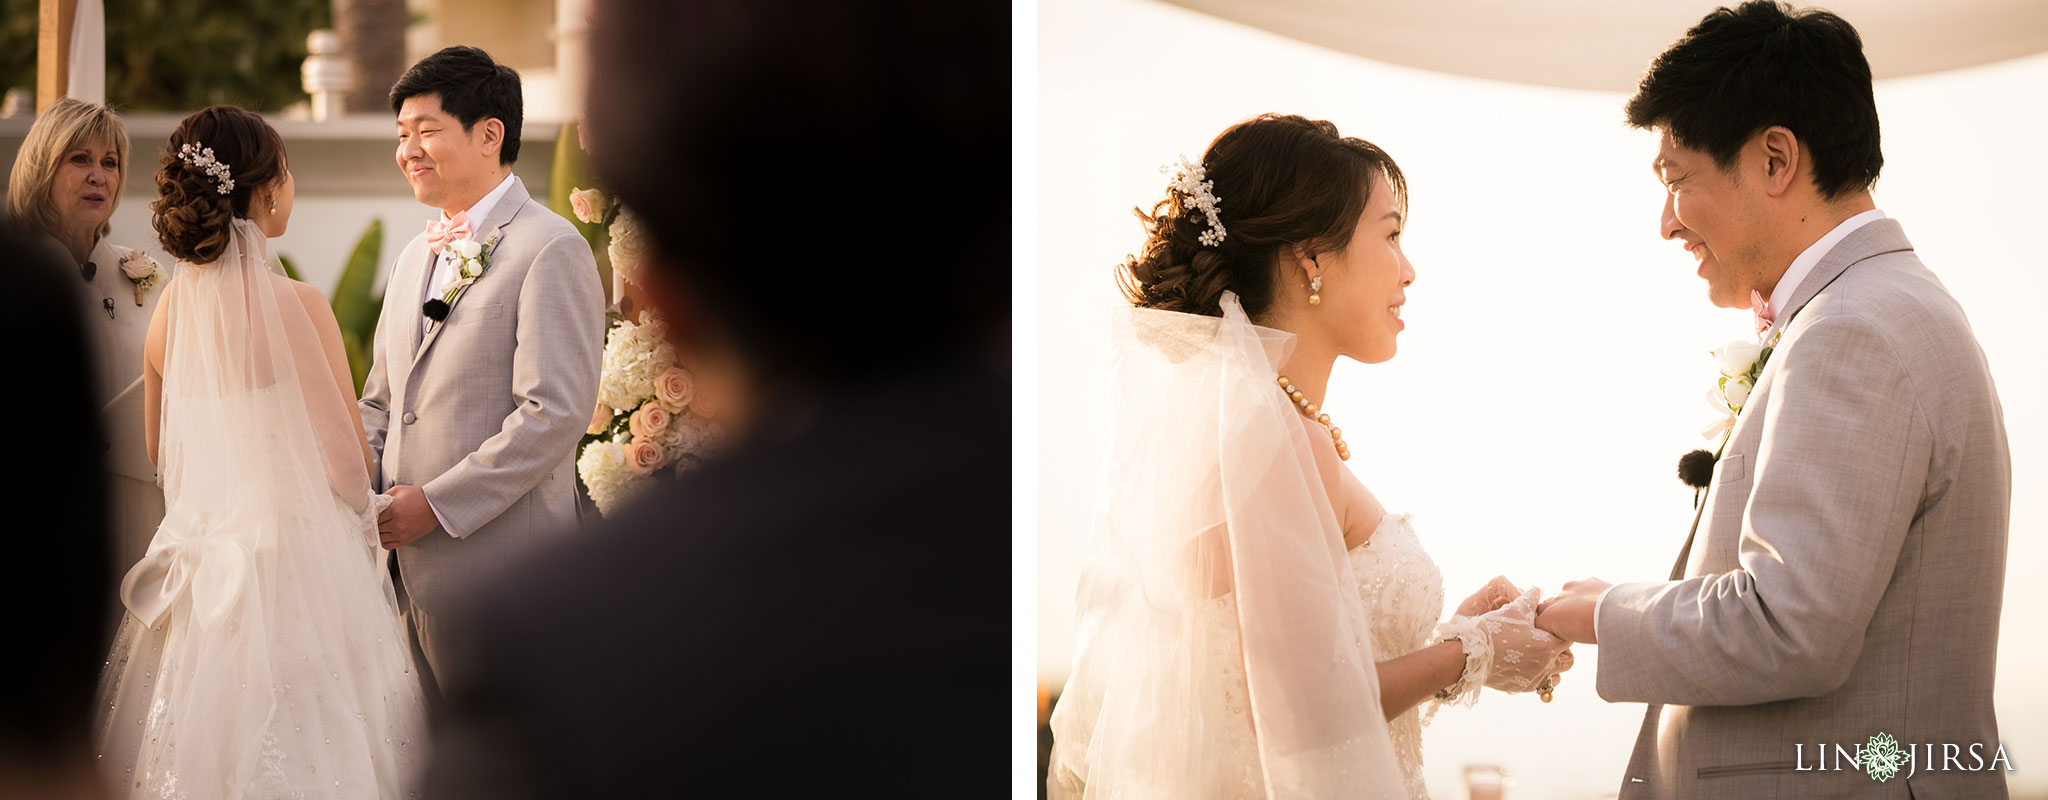 30 monarch beach resort wedding ceremony photography